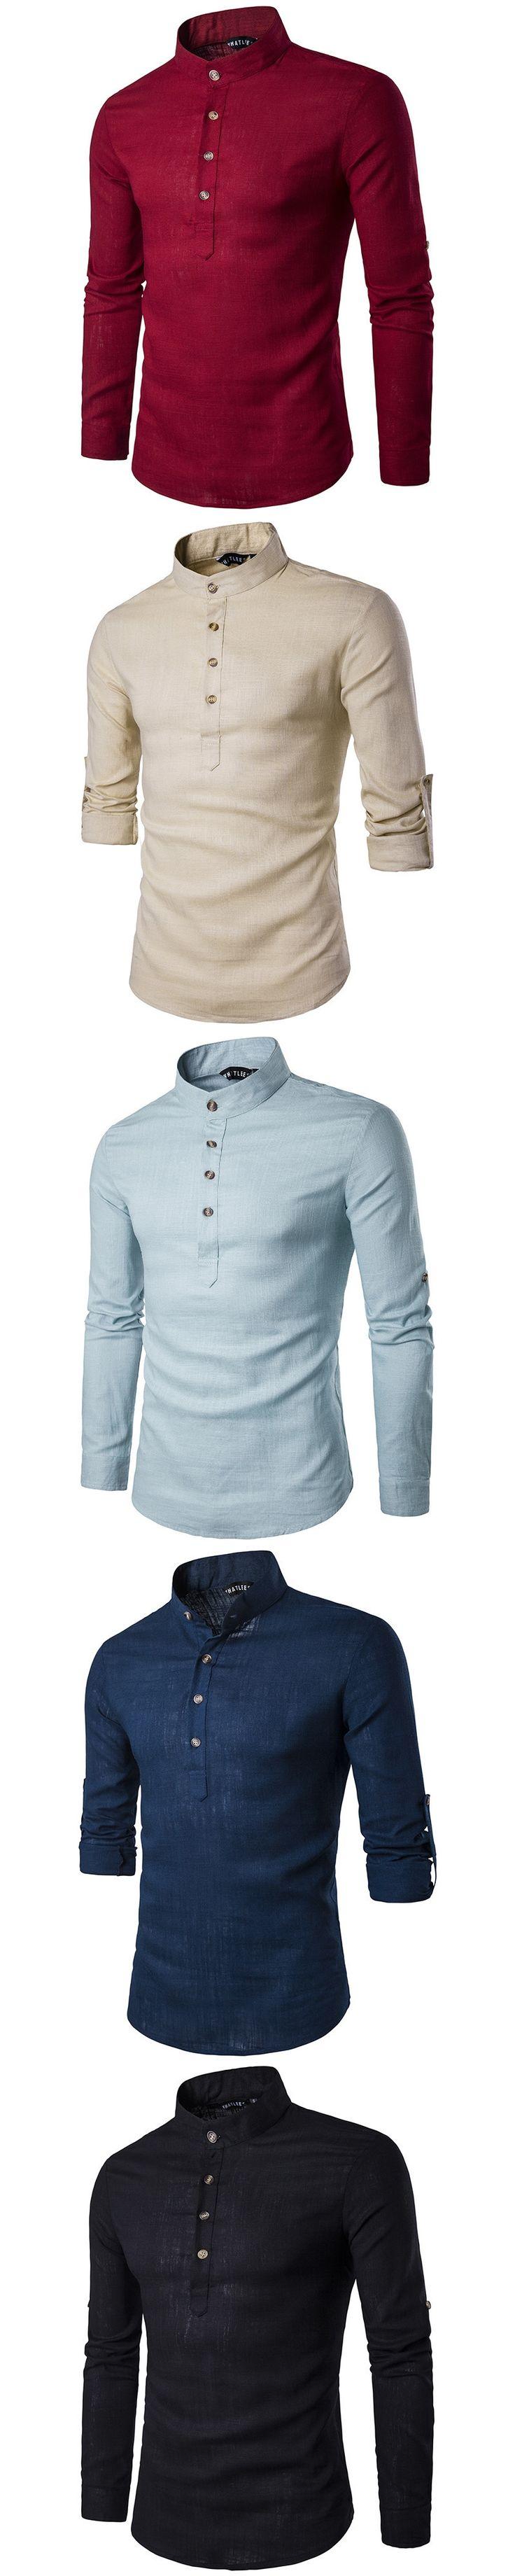 Fashion Men Shirts Long Sleeve Solid Line Shirt Pullover Men Tops Slim Fit Tuxedo Groom Male Shirts S-XXL 2017 European Size B17